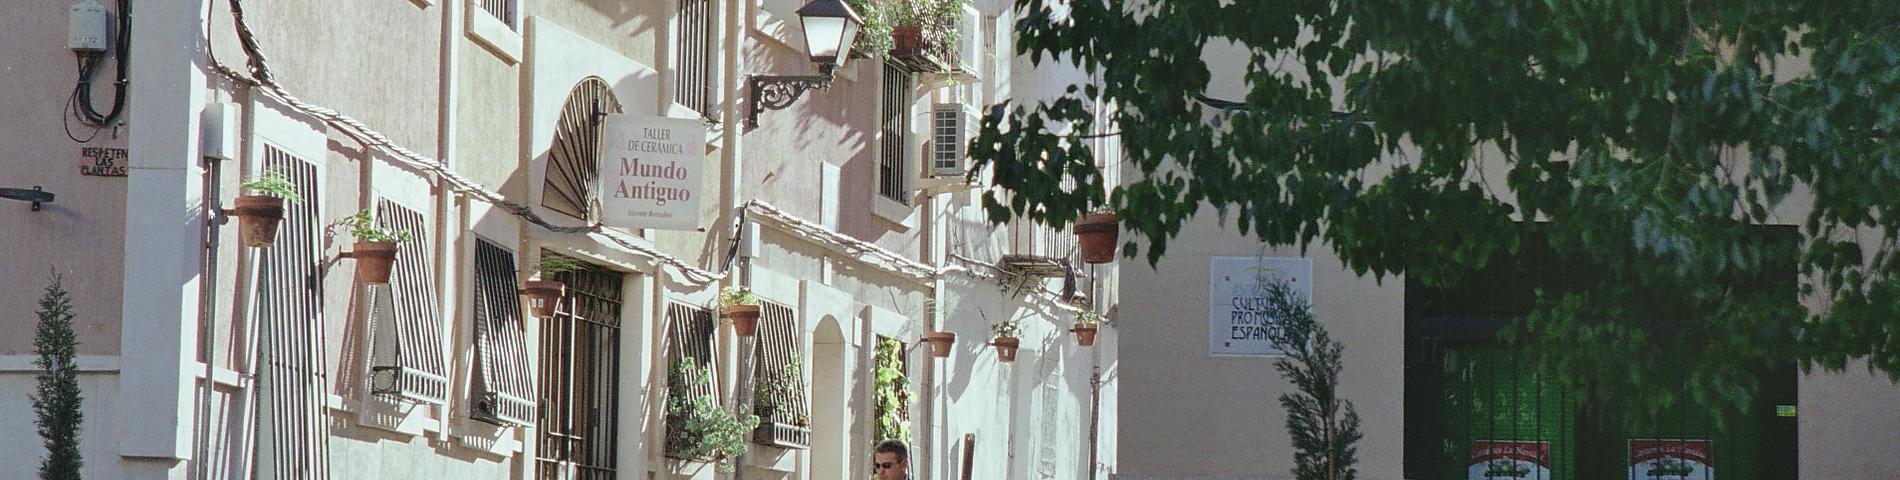 Proyecto Español图片1